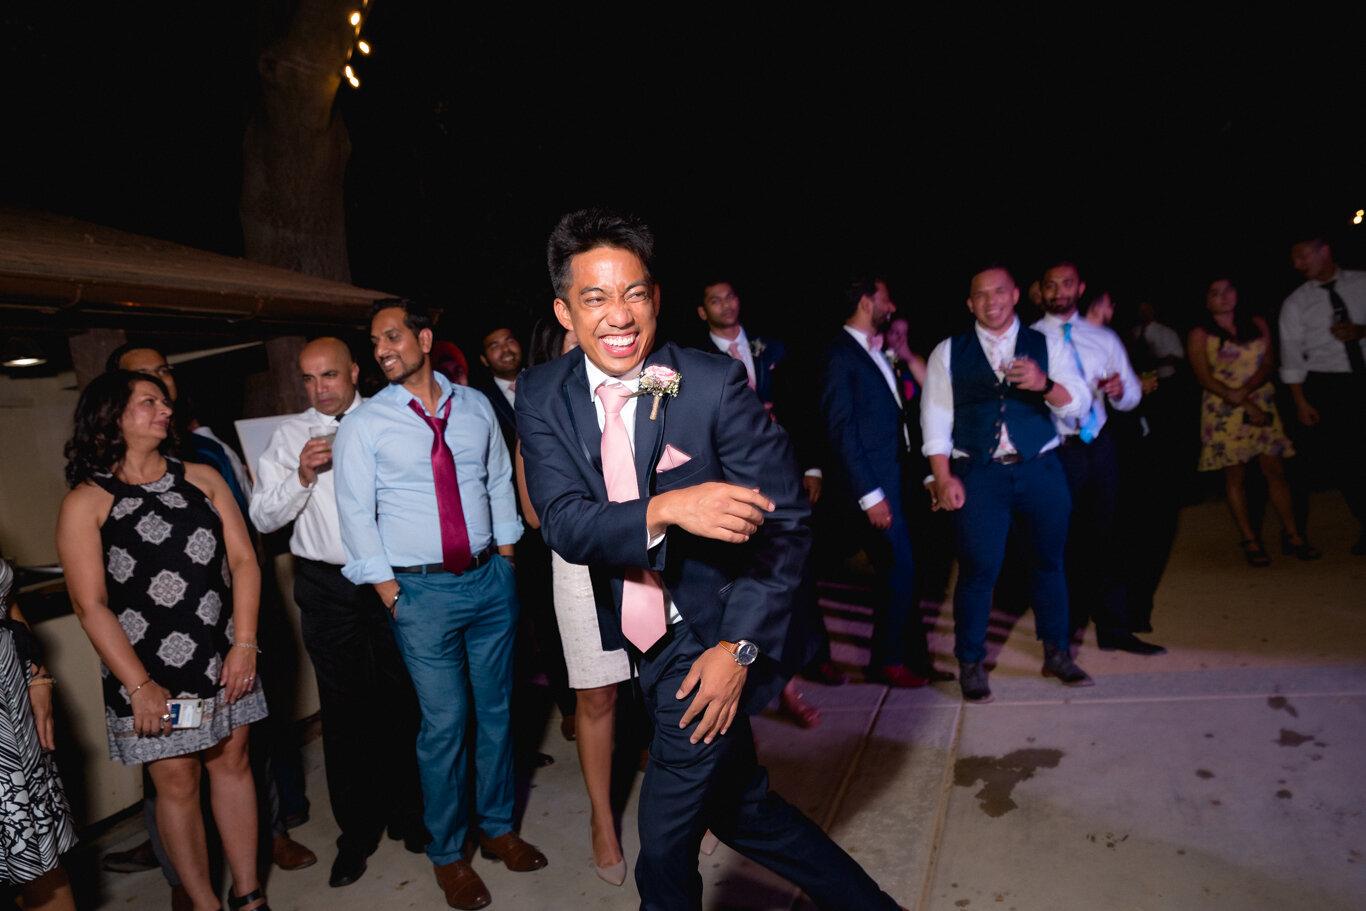 2019.08.24_Emily-Ashir-Wedding-at-the-Maples-6518.jpg